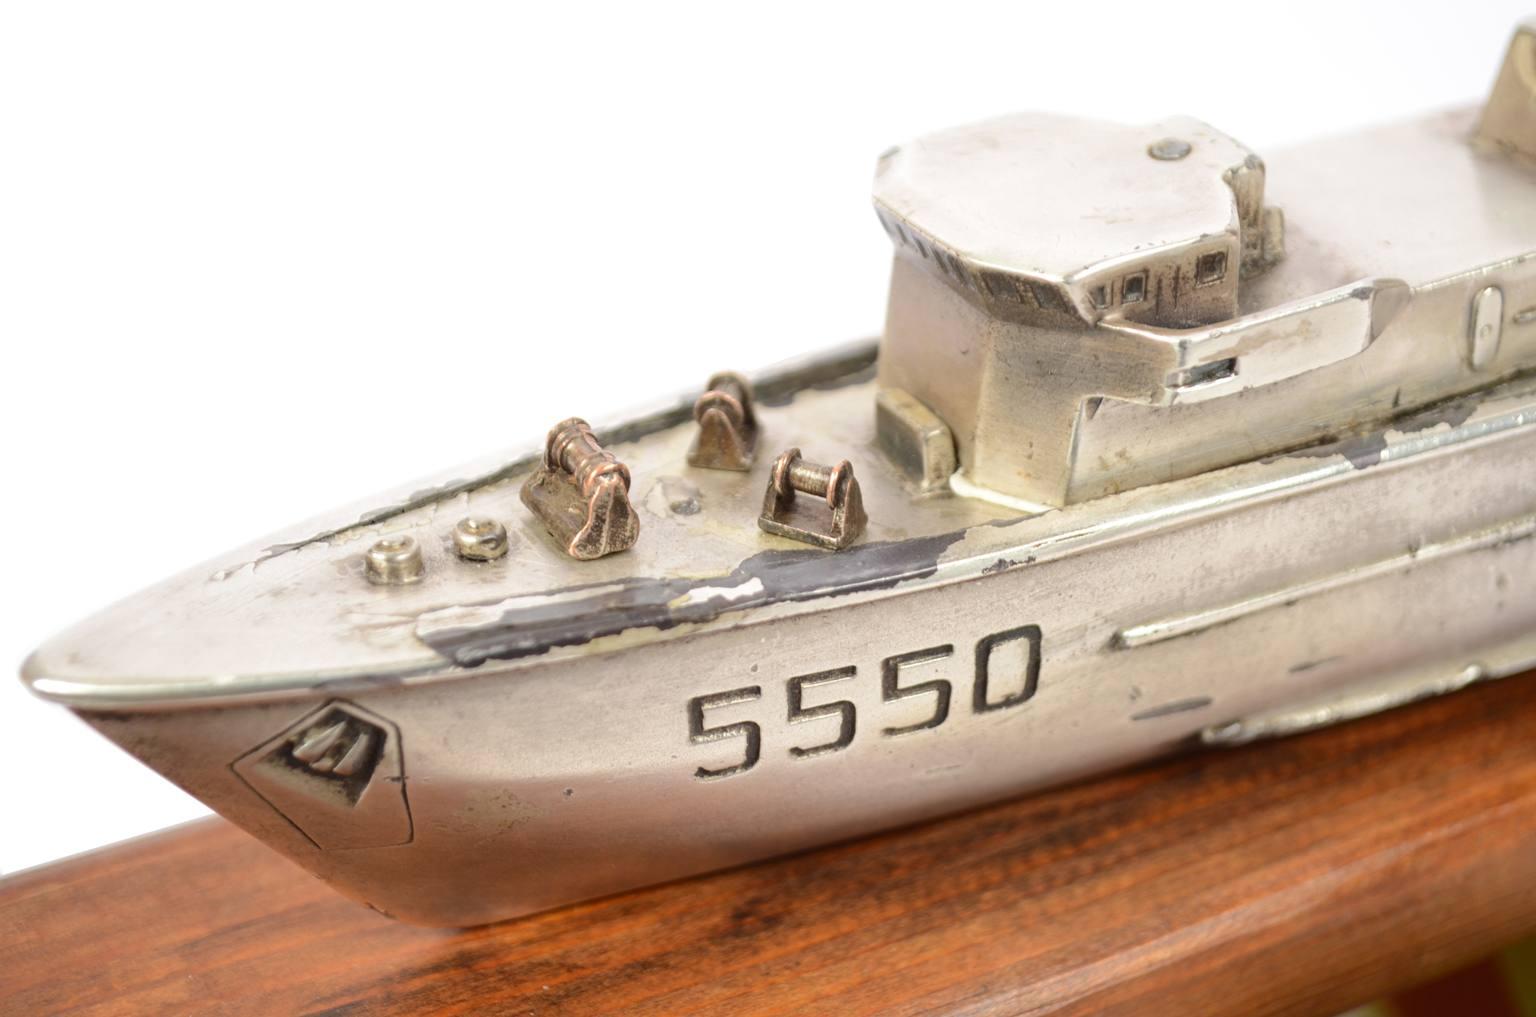 Modelli di navi d'epoca/5252-Modellino nave epoca